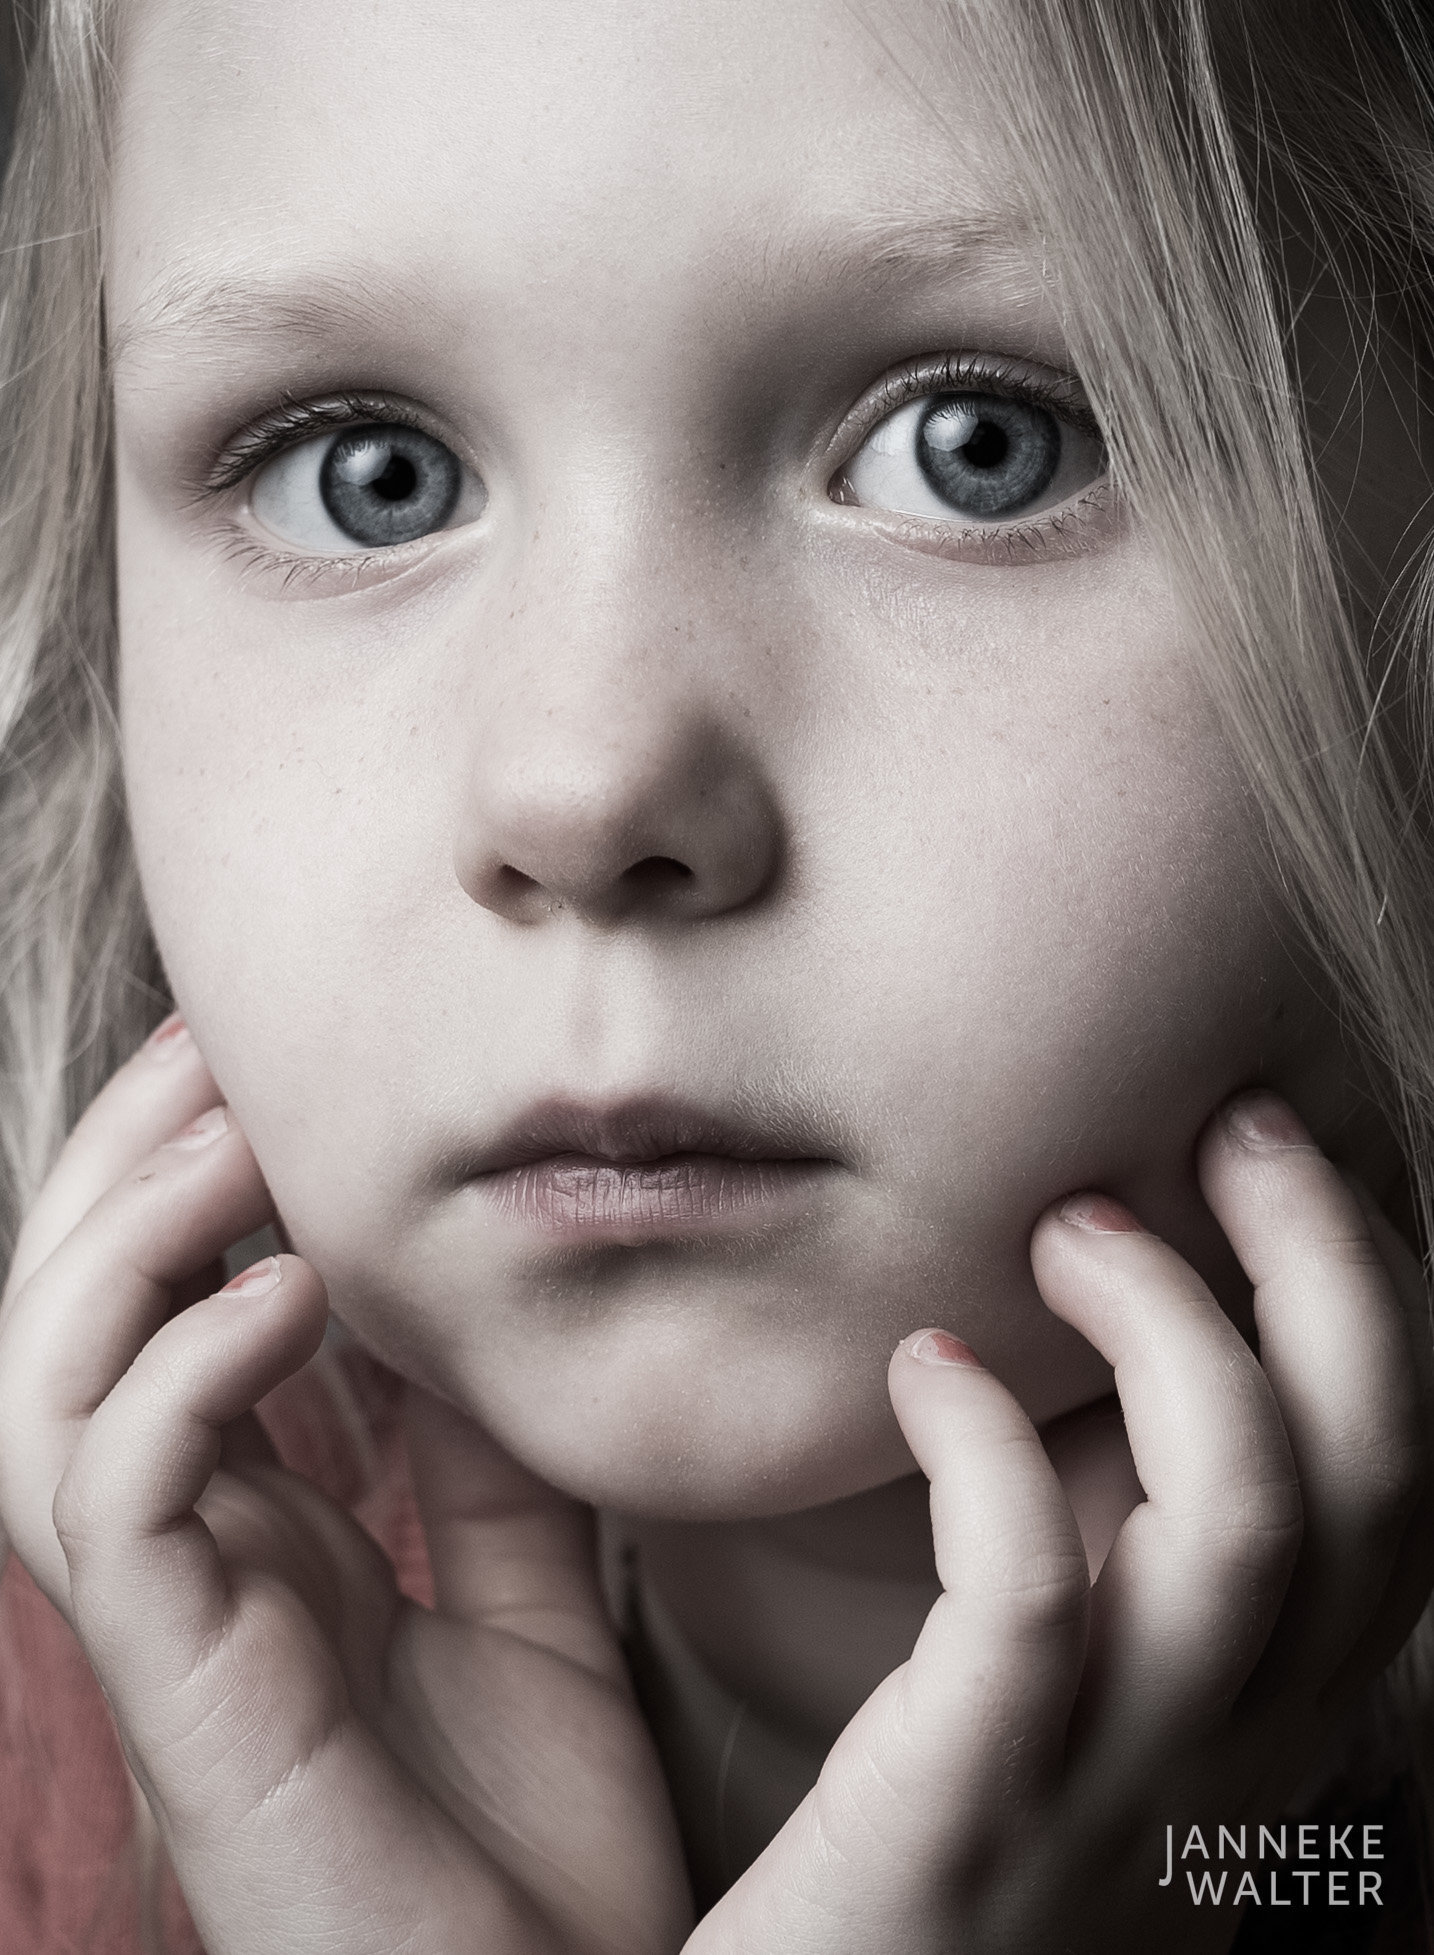 Portretfoto kind close-up @ Janneke Walter, kinderfotograaf Utrecht De Bilt